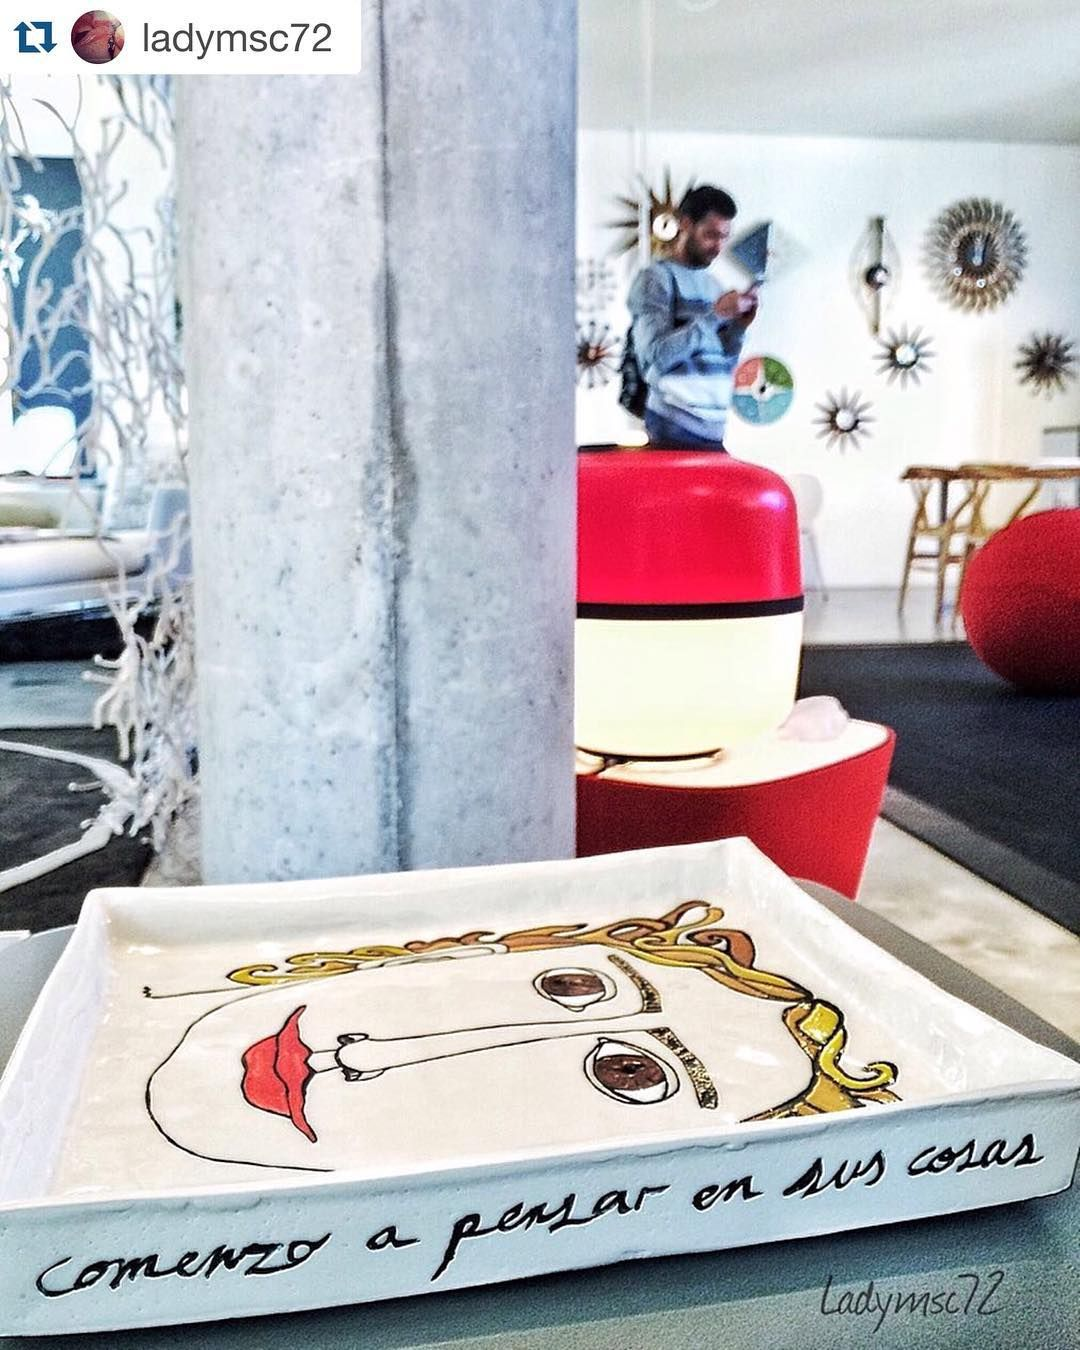 Gracias por la foto @ladymsc72 tiene unos colores preciosos .  #arq #showroom #pepecabrera #pepecabrerastudio #denia #design #interiordesign #architecture #inspiration #arquitectura #decor #designer #homedecor #style #home #decoracion #vsco #interiorismo #vscocam #archilovers #uberkreative #myoklatyle #dinesen #styling #furniture #igersvalencia #styleatmine